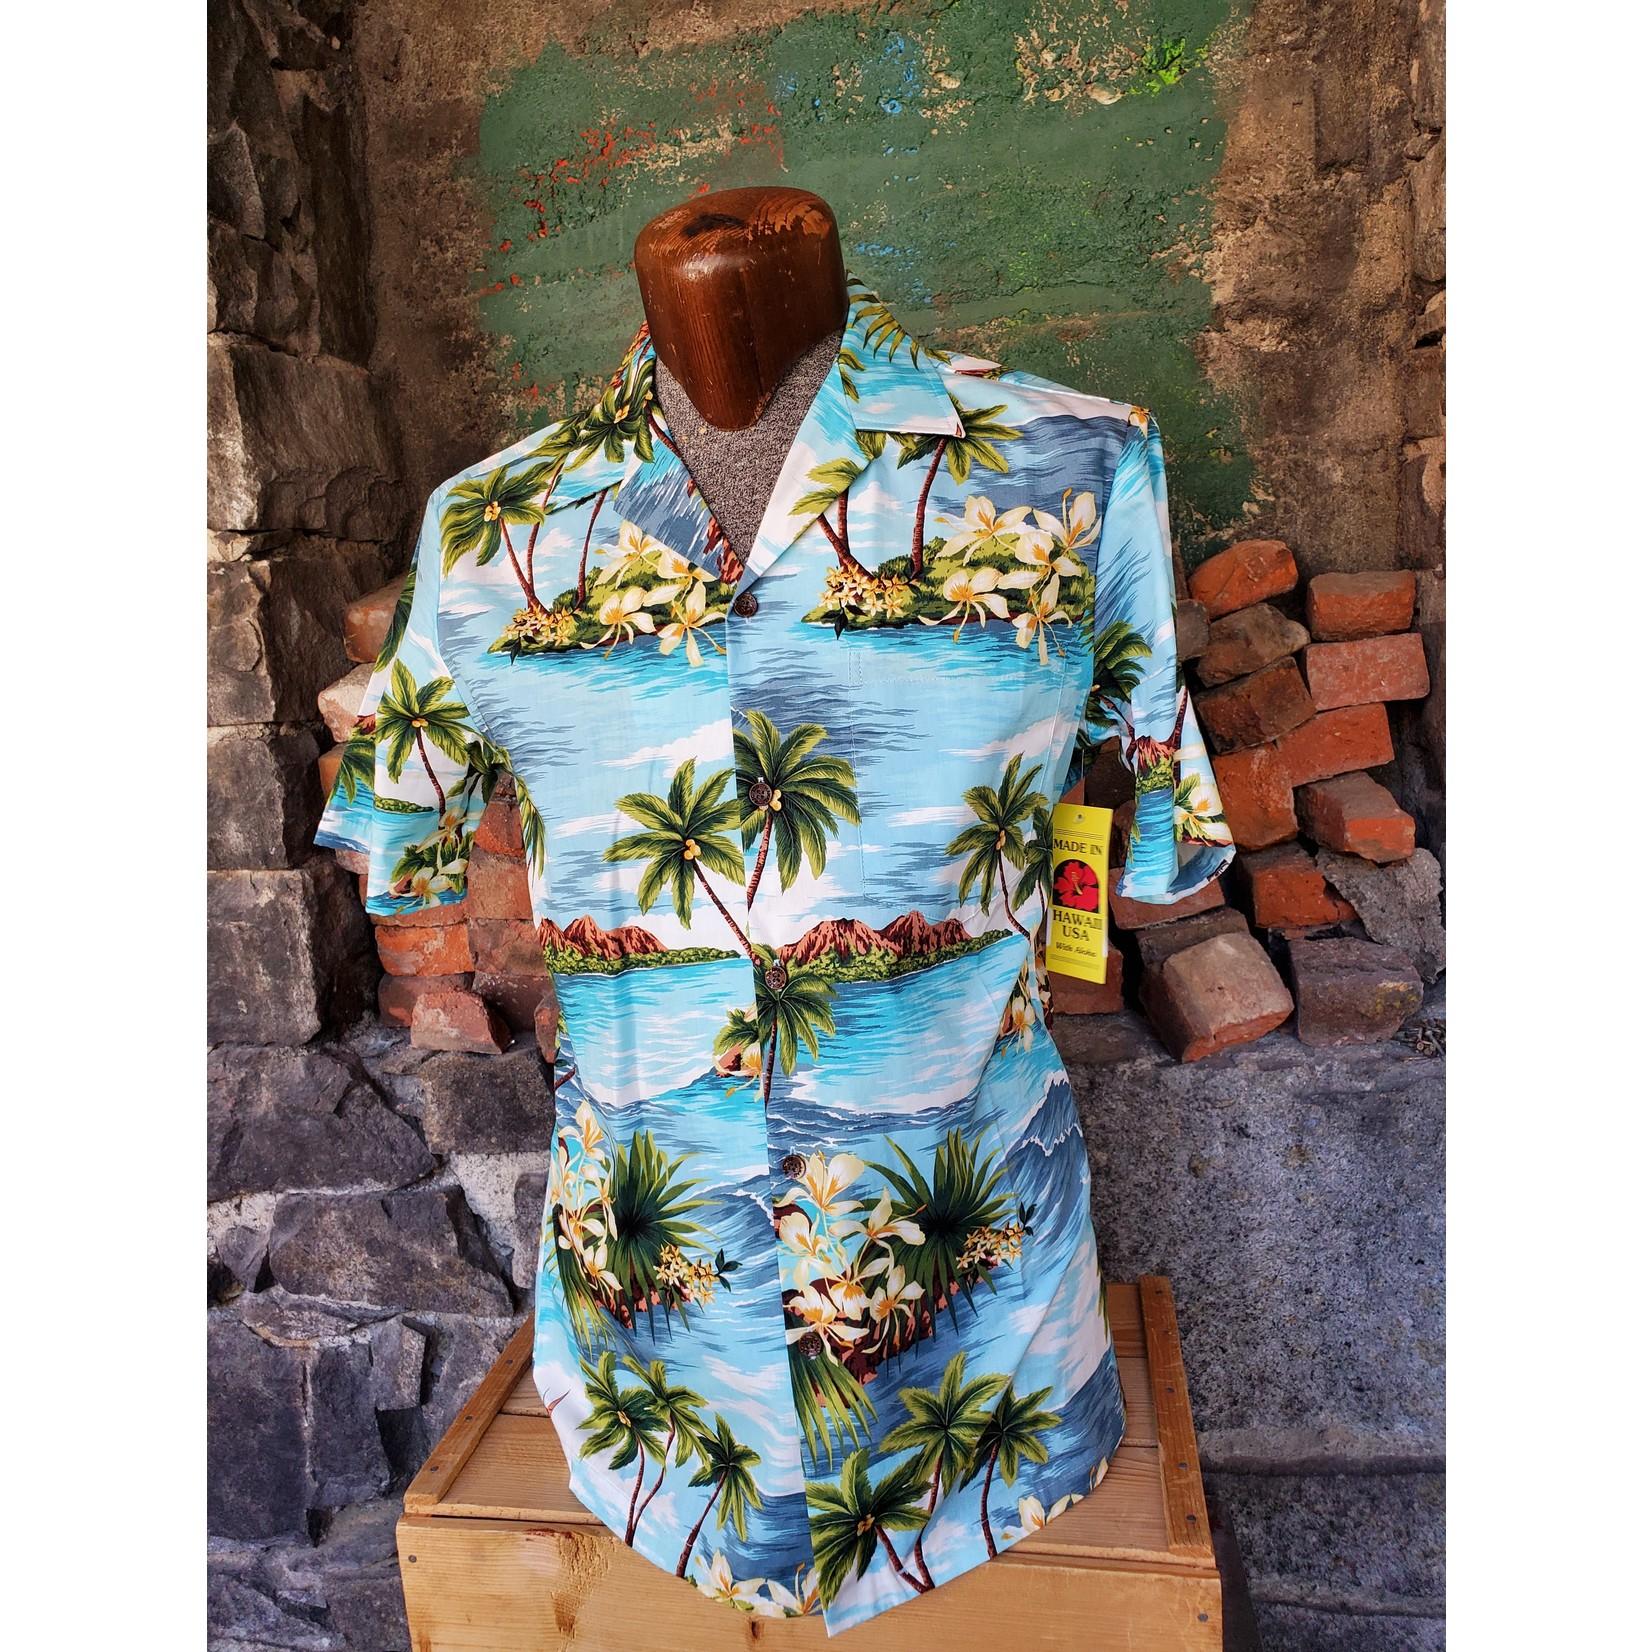 RJC Authentic Hawaiian Shirt - Turquoise Palm Trees